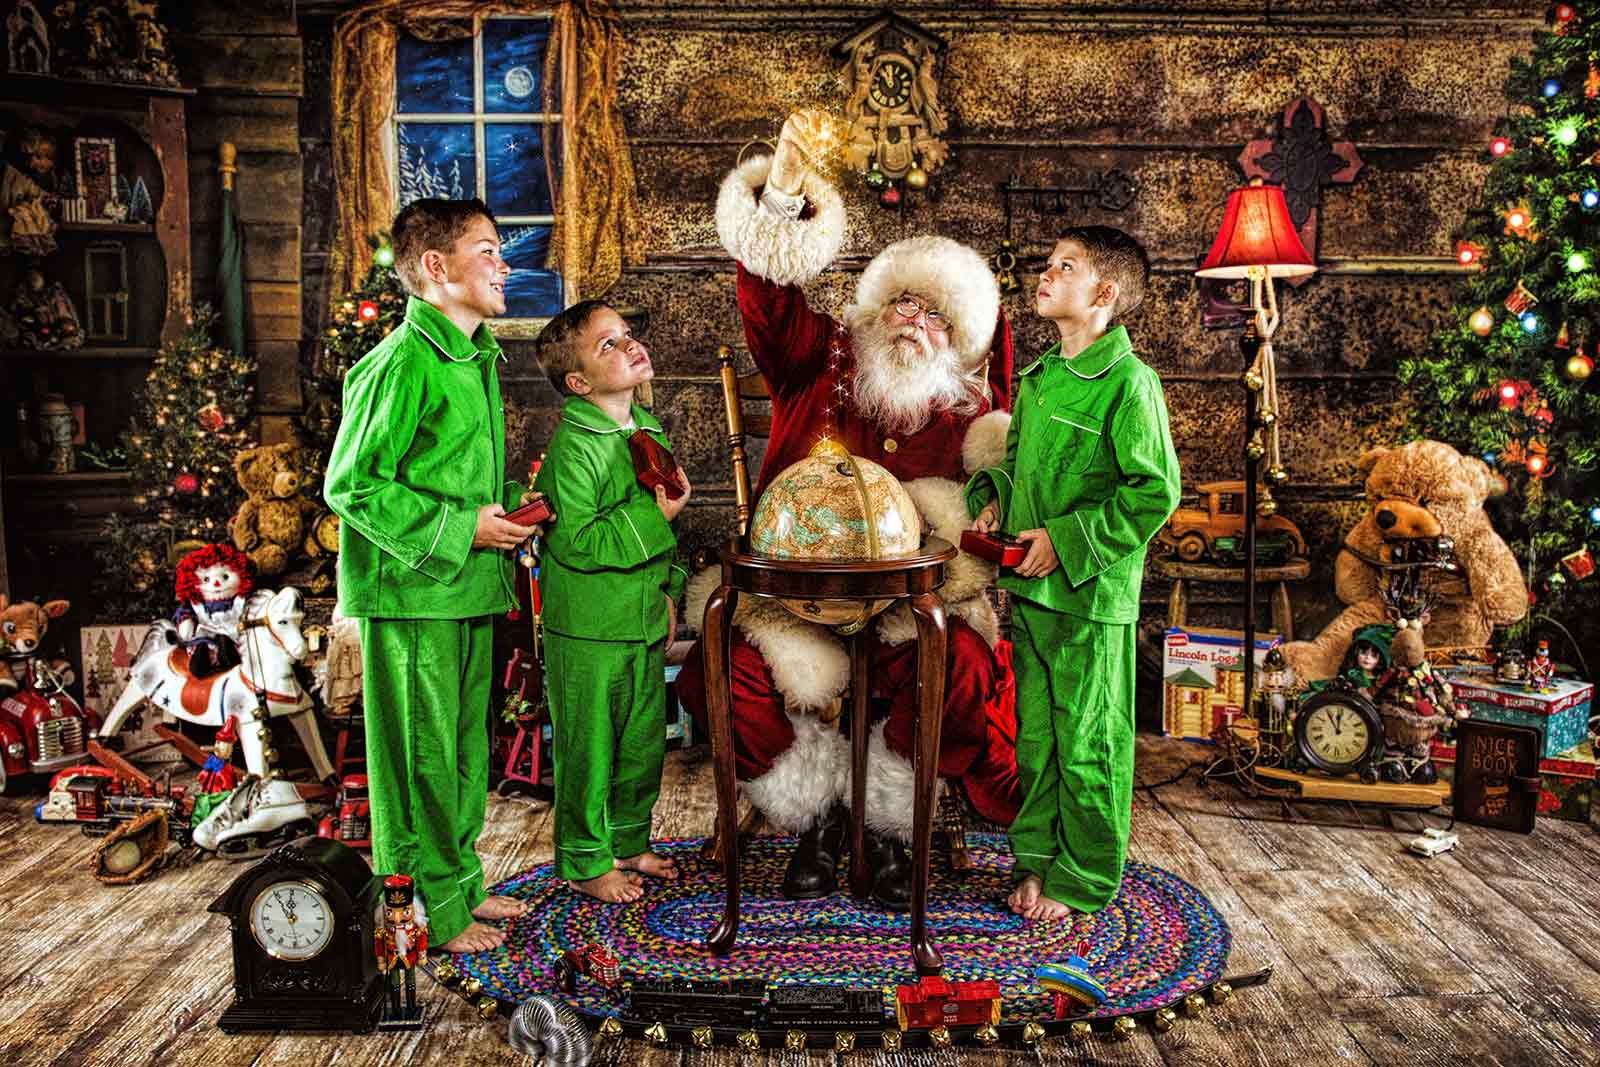 007_Magic-of-Santa-Anna-Thielen-Photography